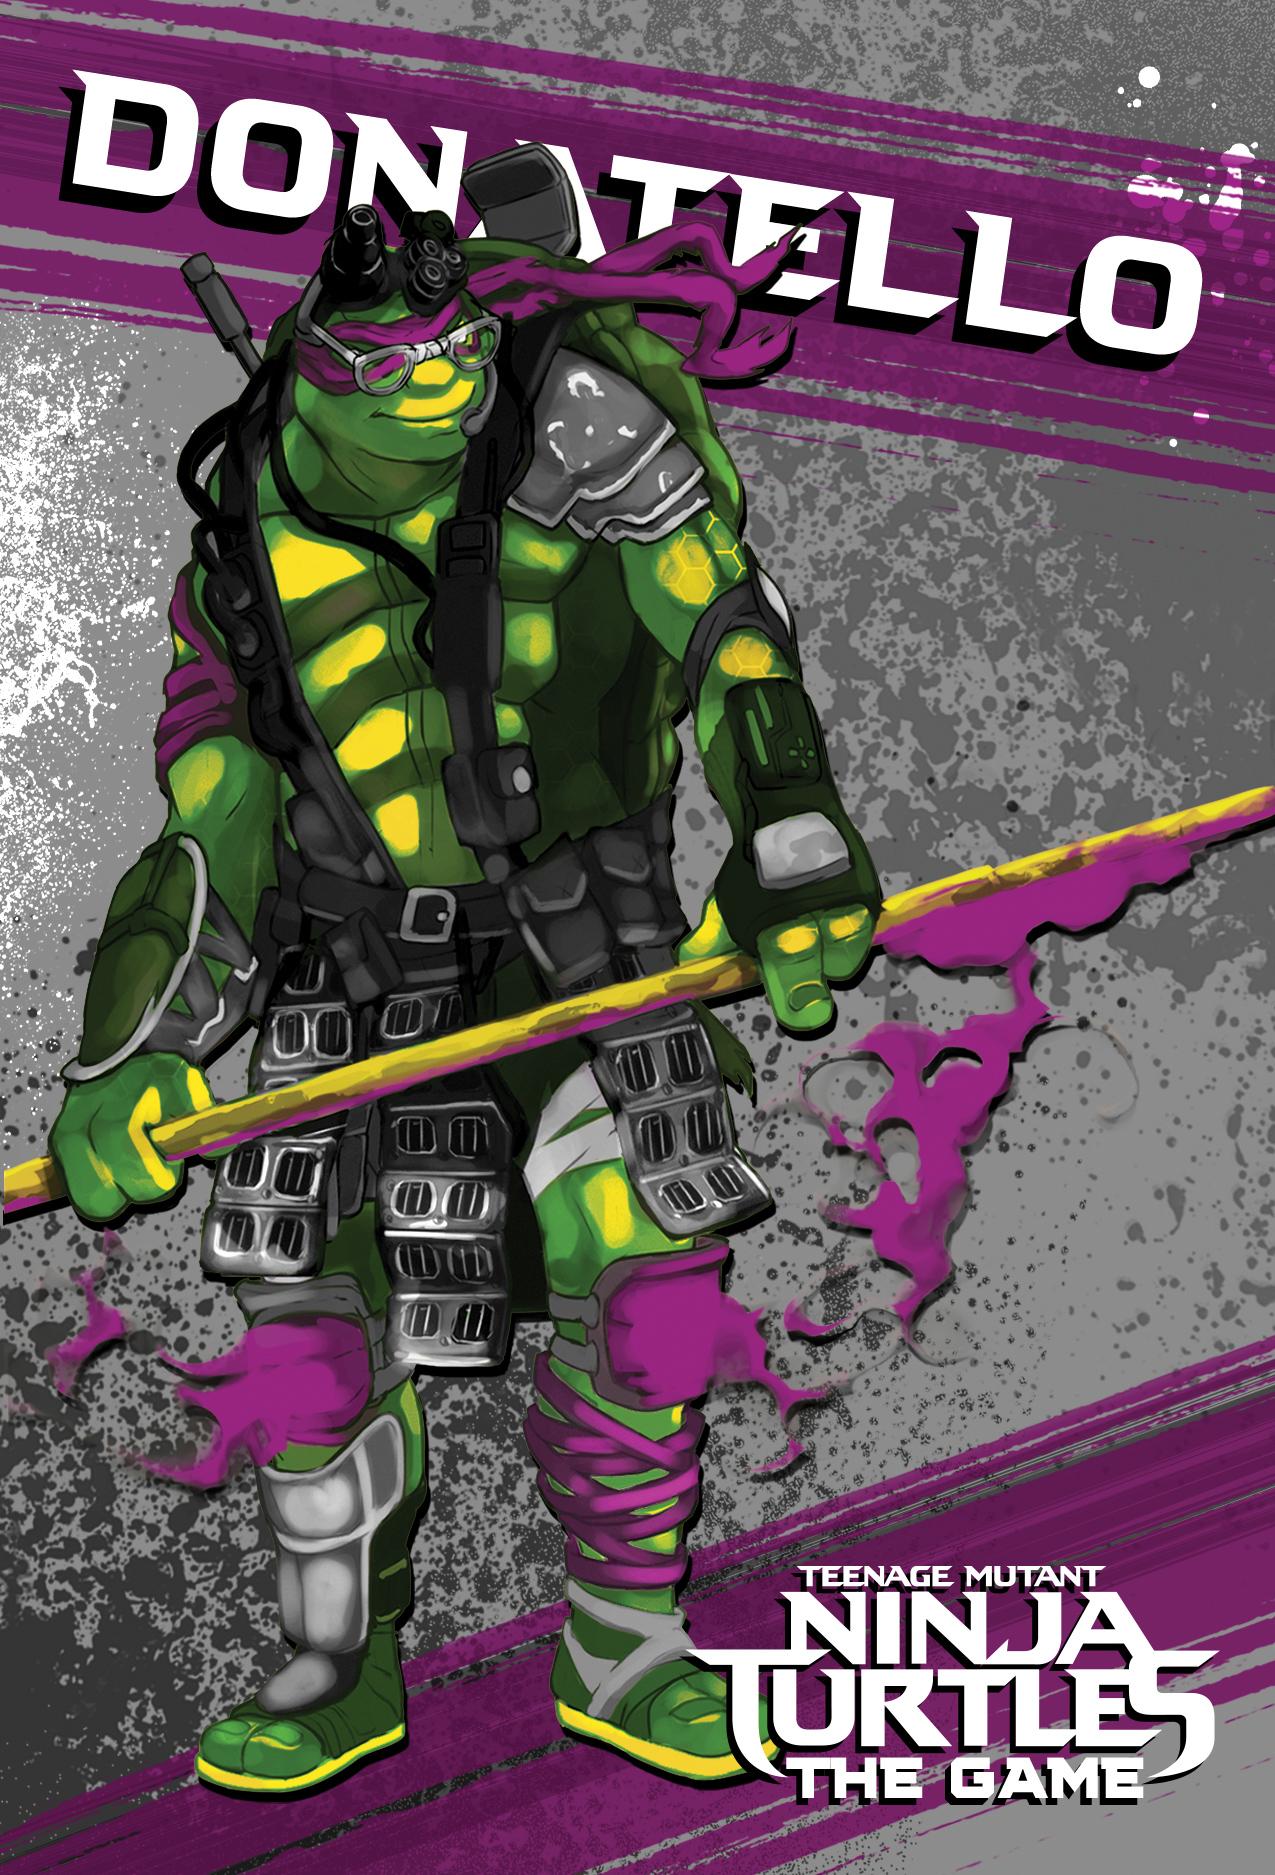 Donatello (2014 video games)